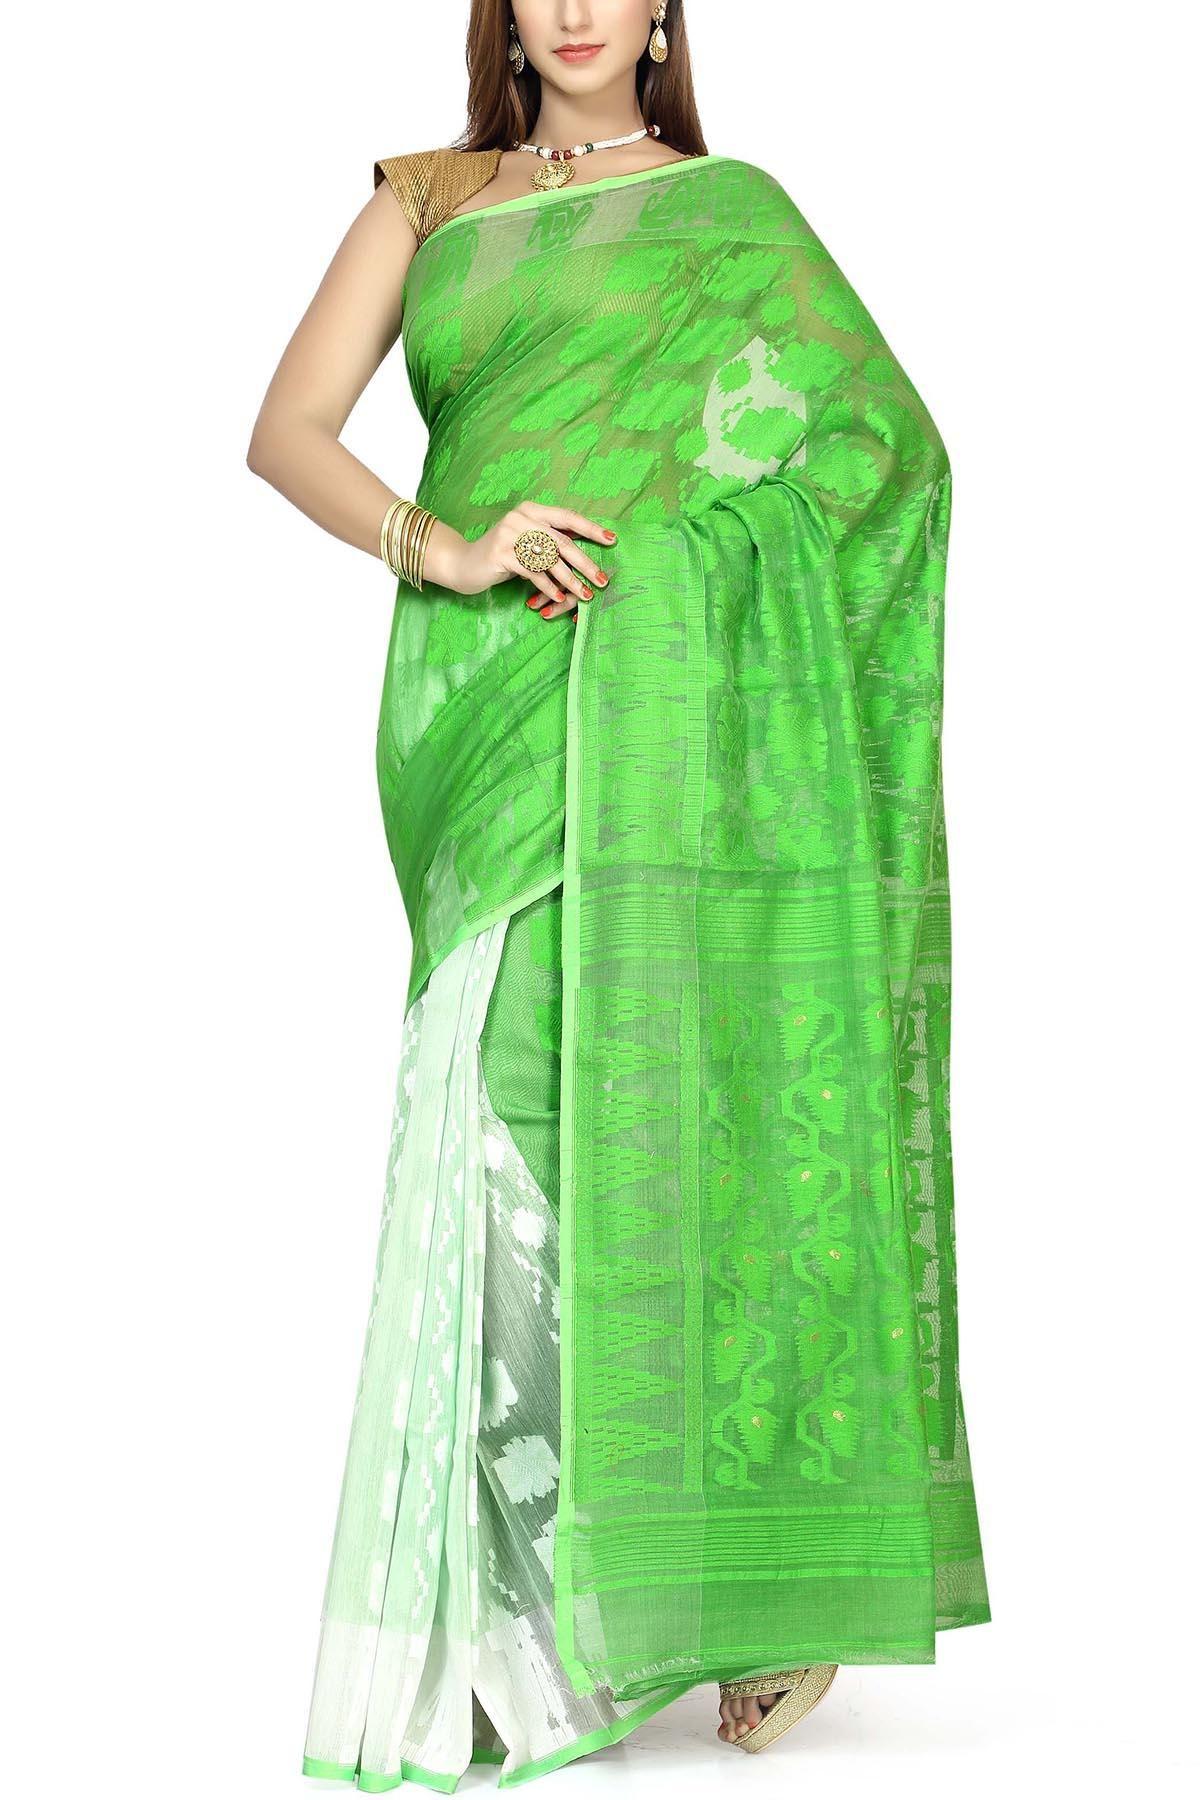 5ea6fa0ff9 Lime Green & White Dhakai Cotton Jamdani Saree   Muslin Myths ...